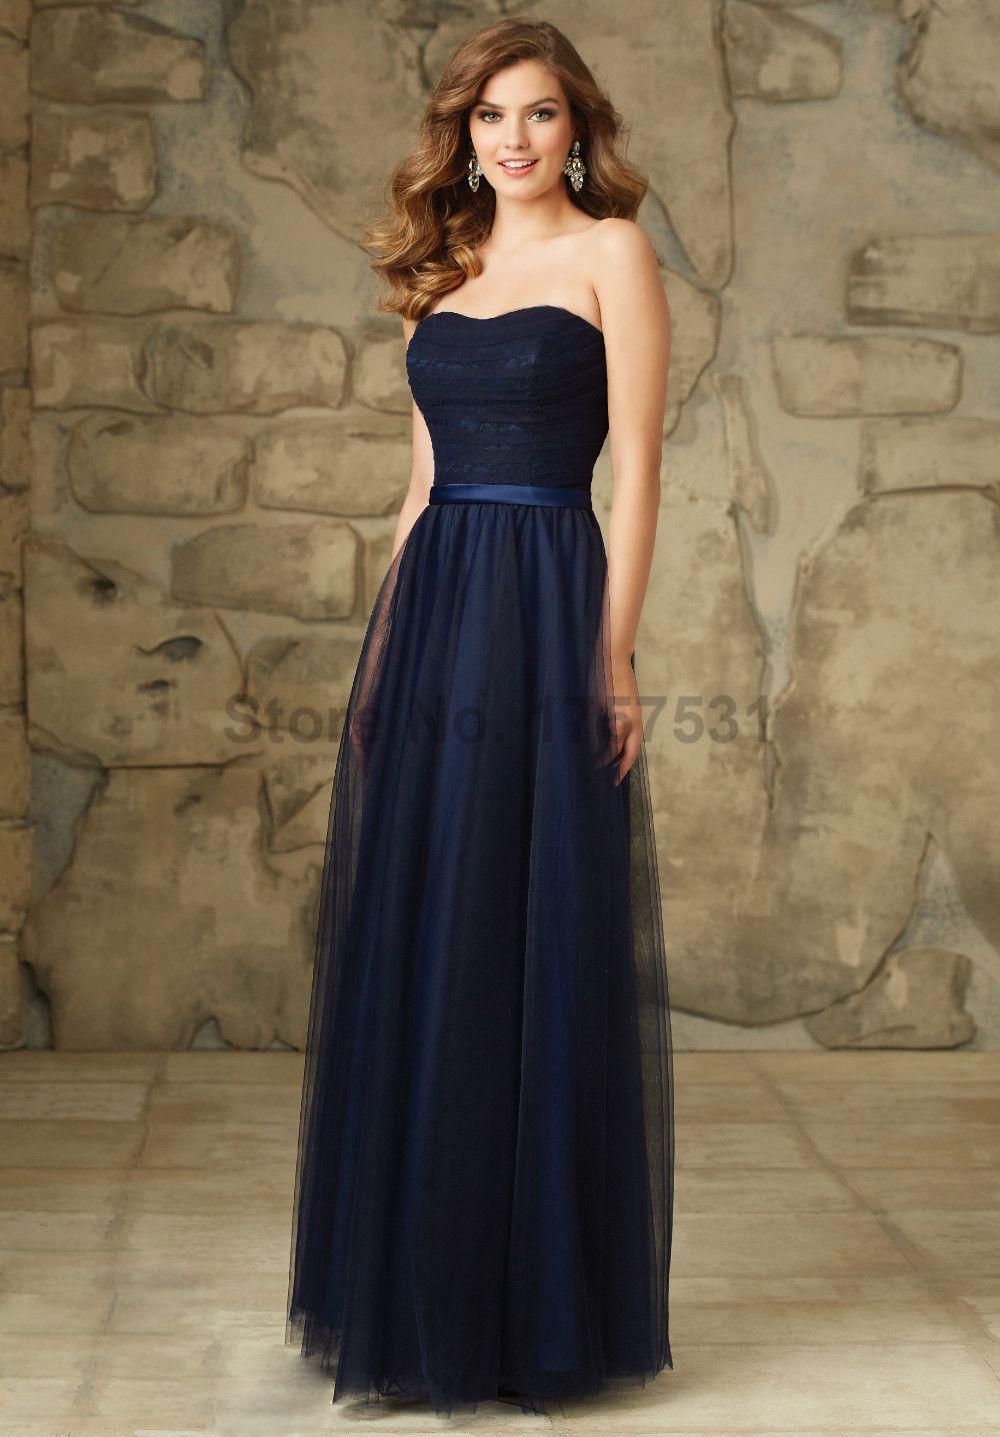 8fb4bcf0d Cheap 2016 Vestido Madrinha De Casamento azul marino Sweetheart encaje  Vestido De dama De banquete De boda vestidos largos De tul